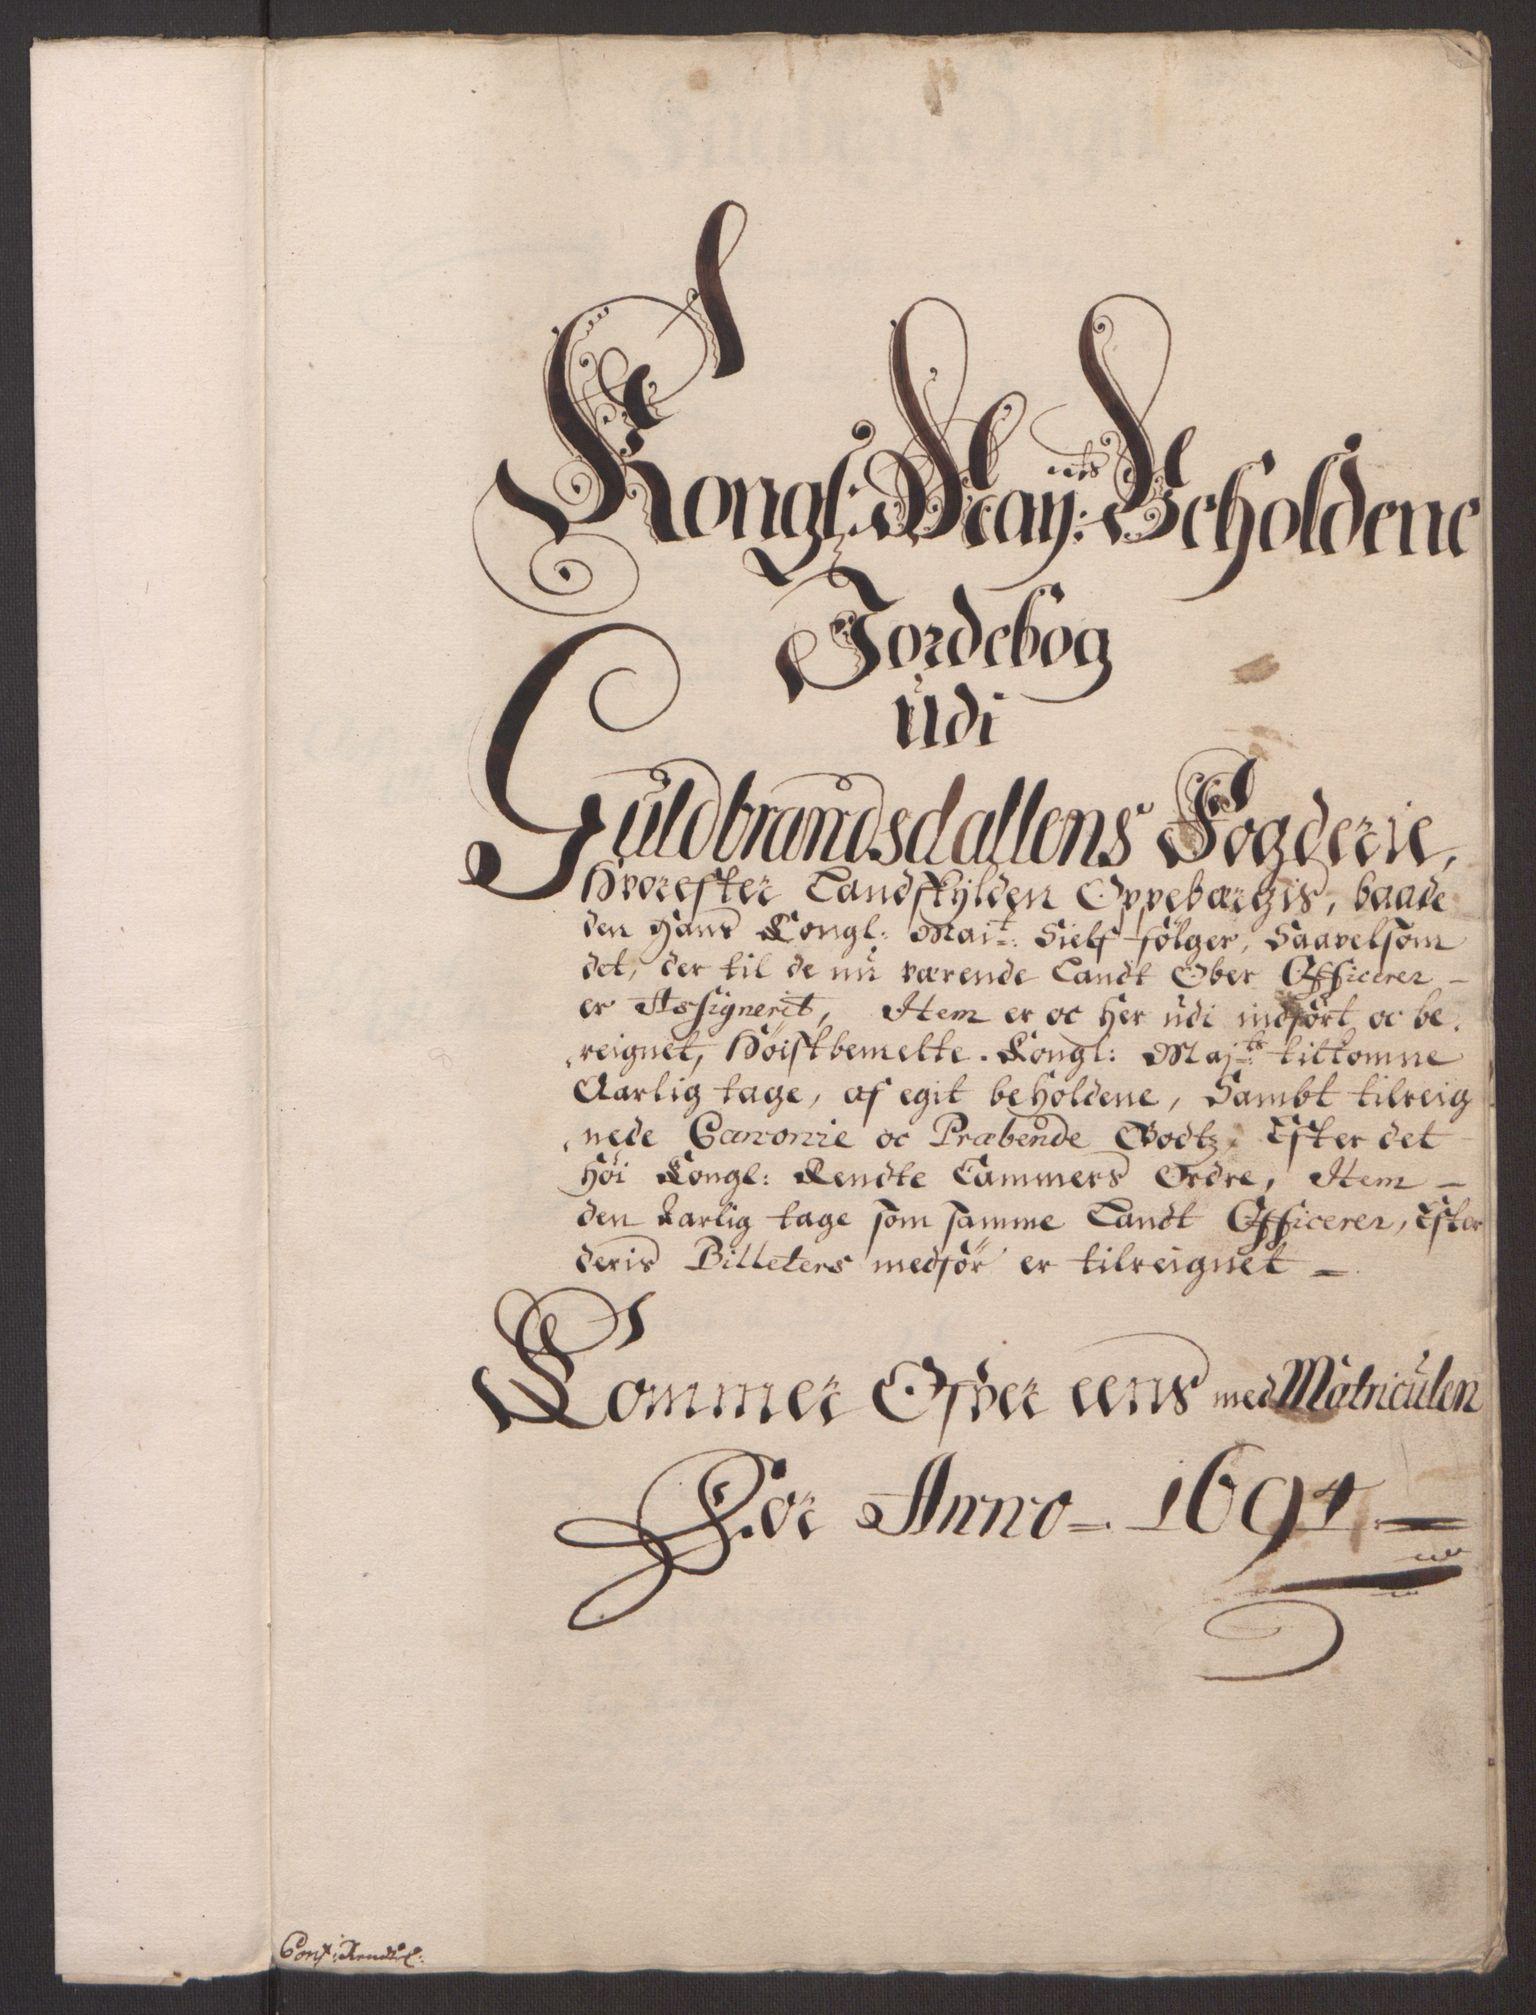 RA, Rentekammeret inntil 1814, Reviderte regnskaper, Fogderegnskap, R17/L1168: Fogderegnskap Gudbrandsdal, 1694, s. 220